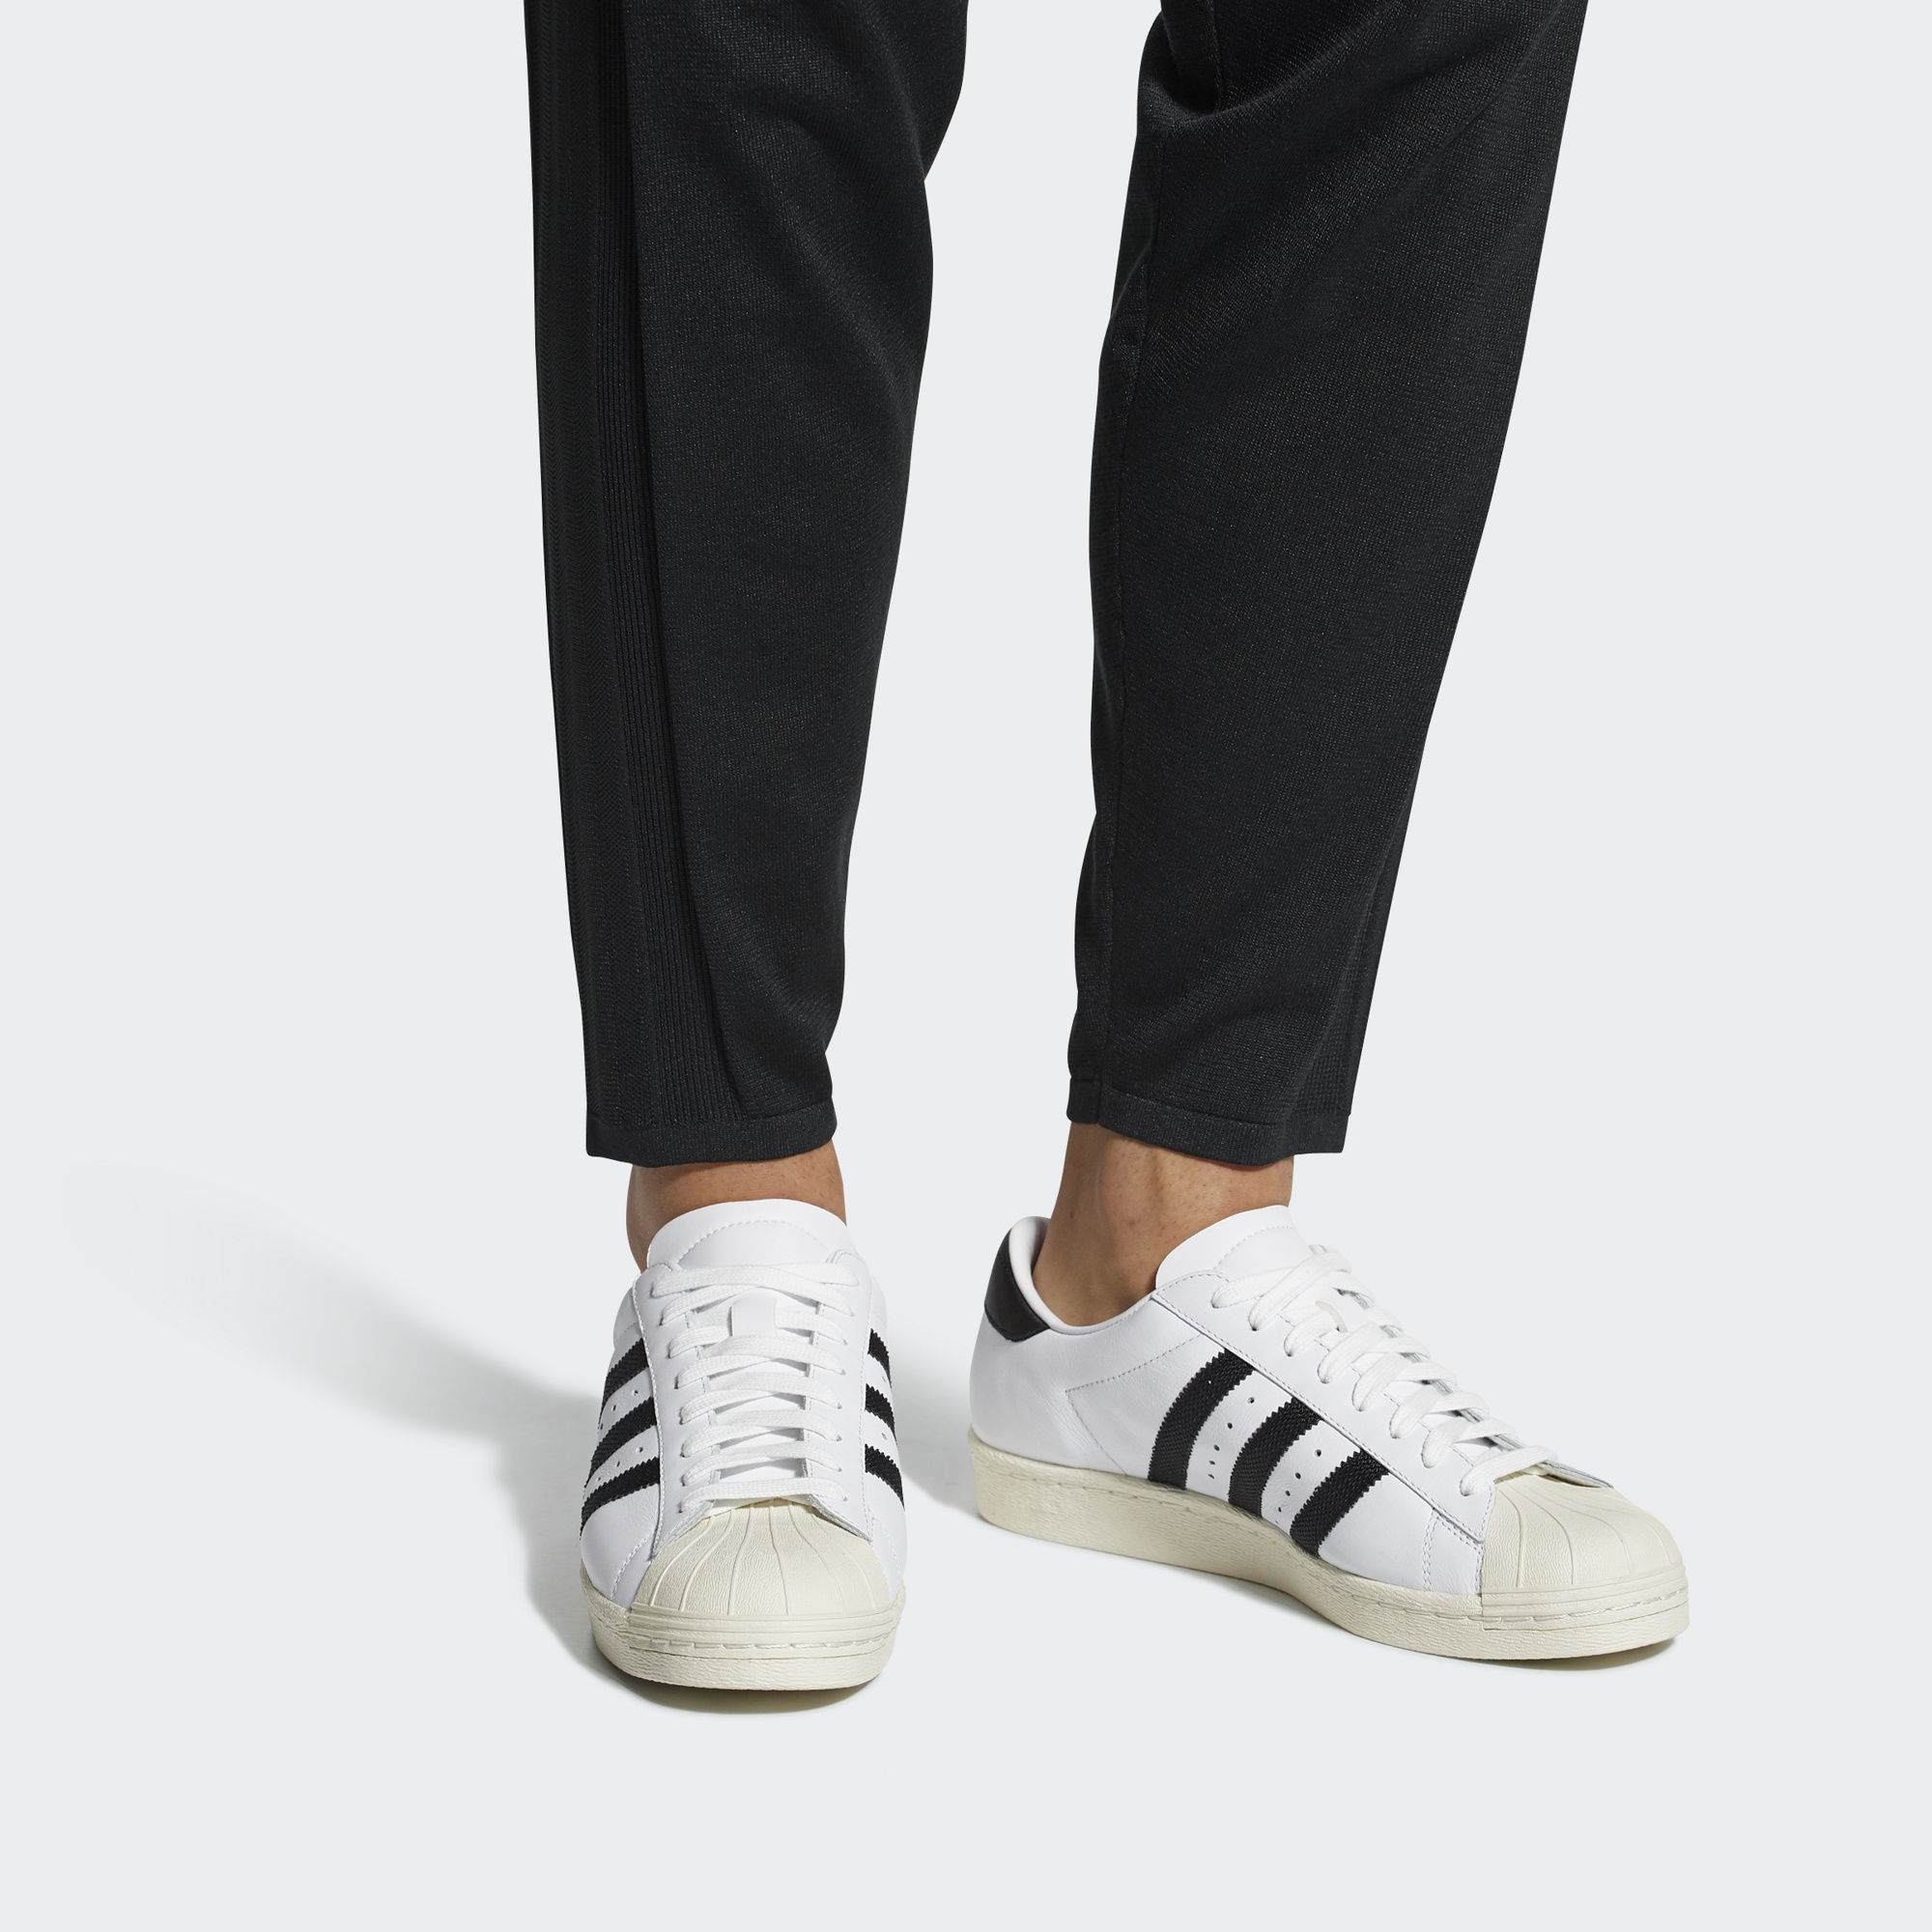 cq2475 adidas